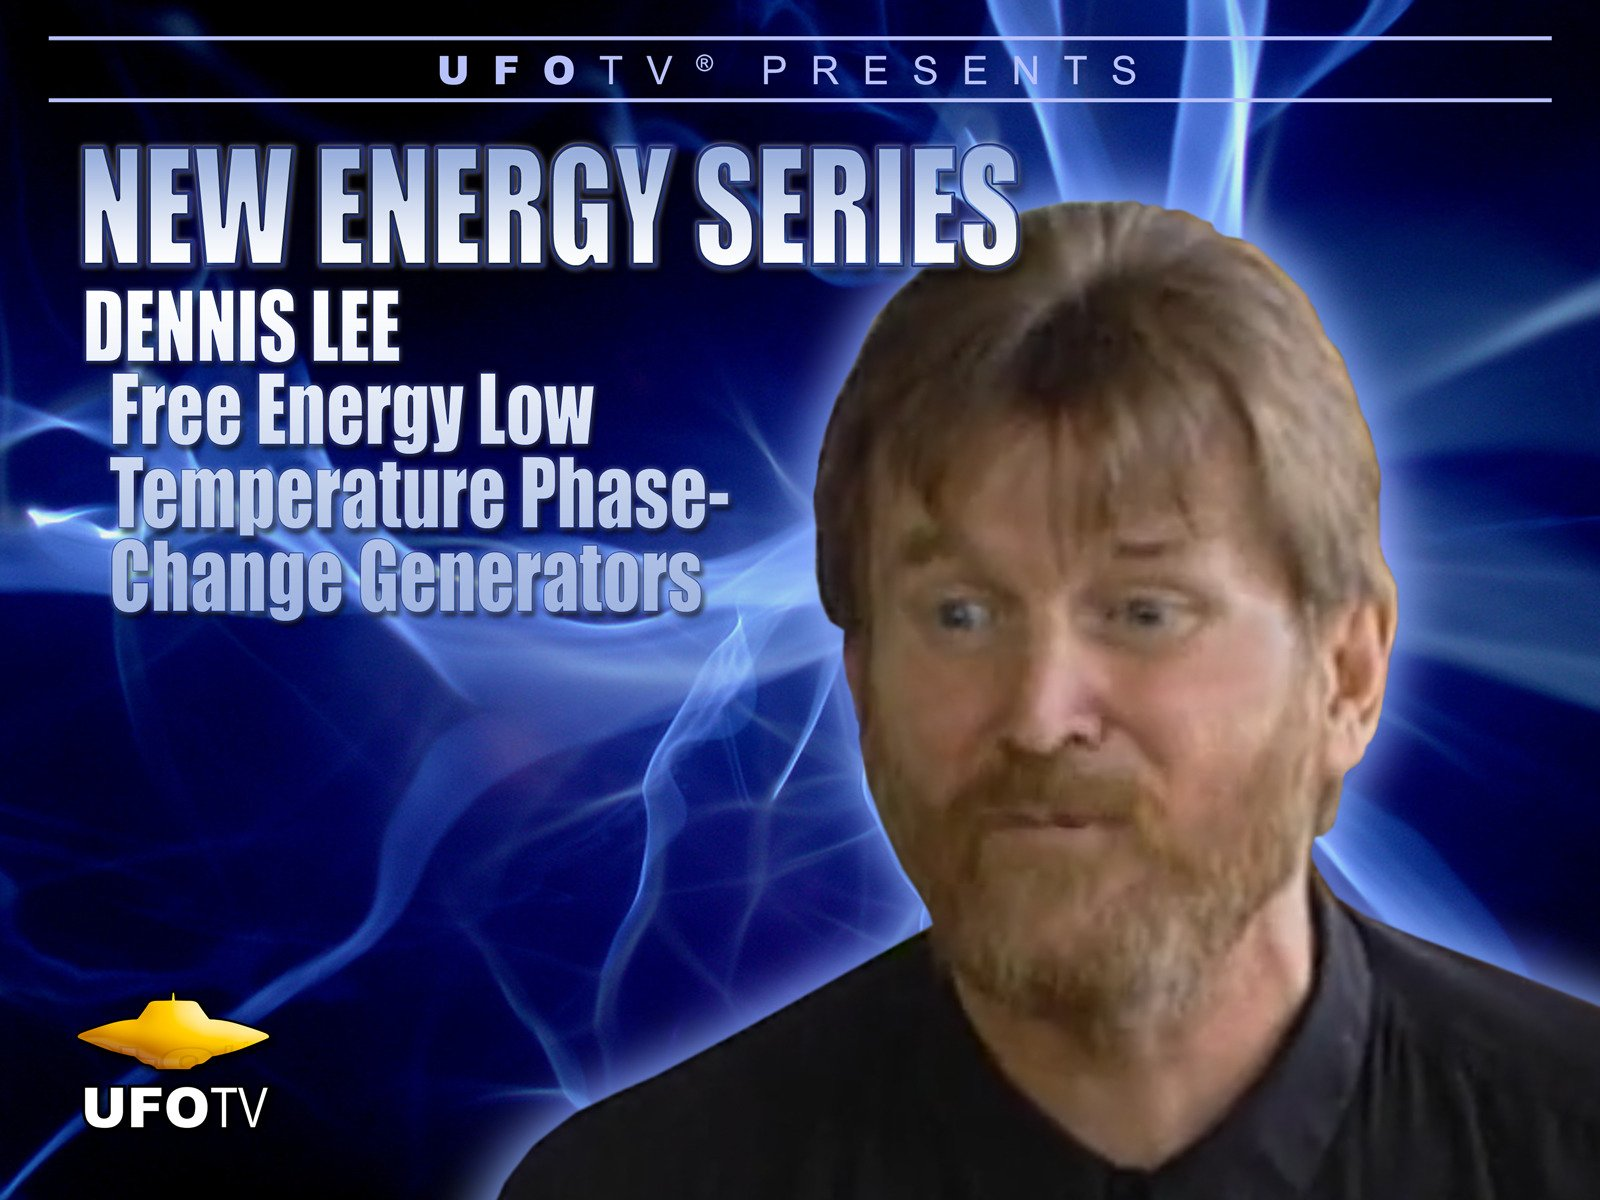 Dennis Lee - Free Energy Low Temperature Phase-Change Generators